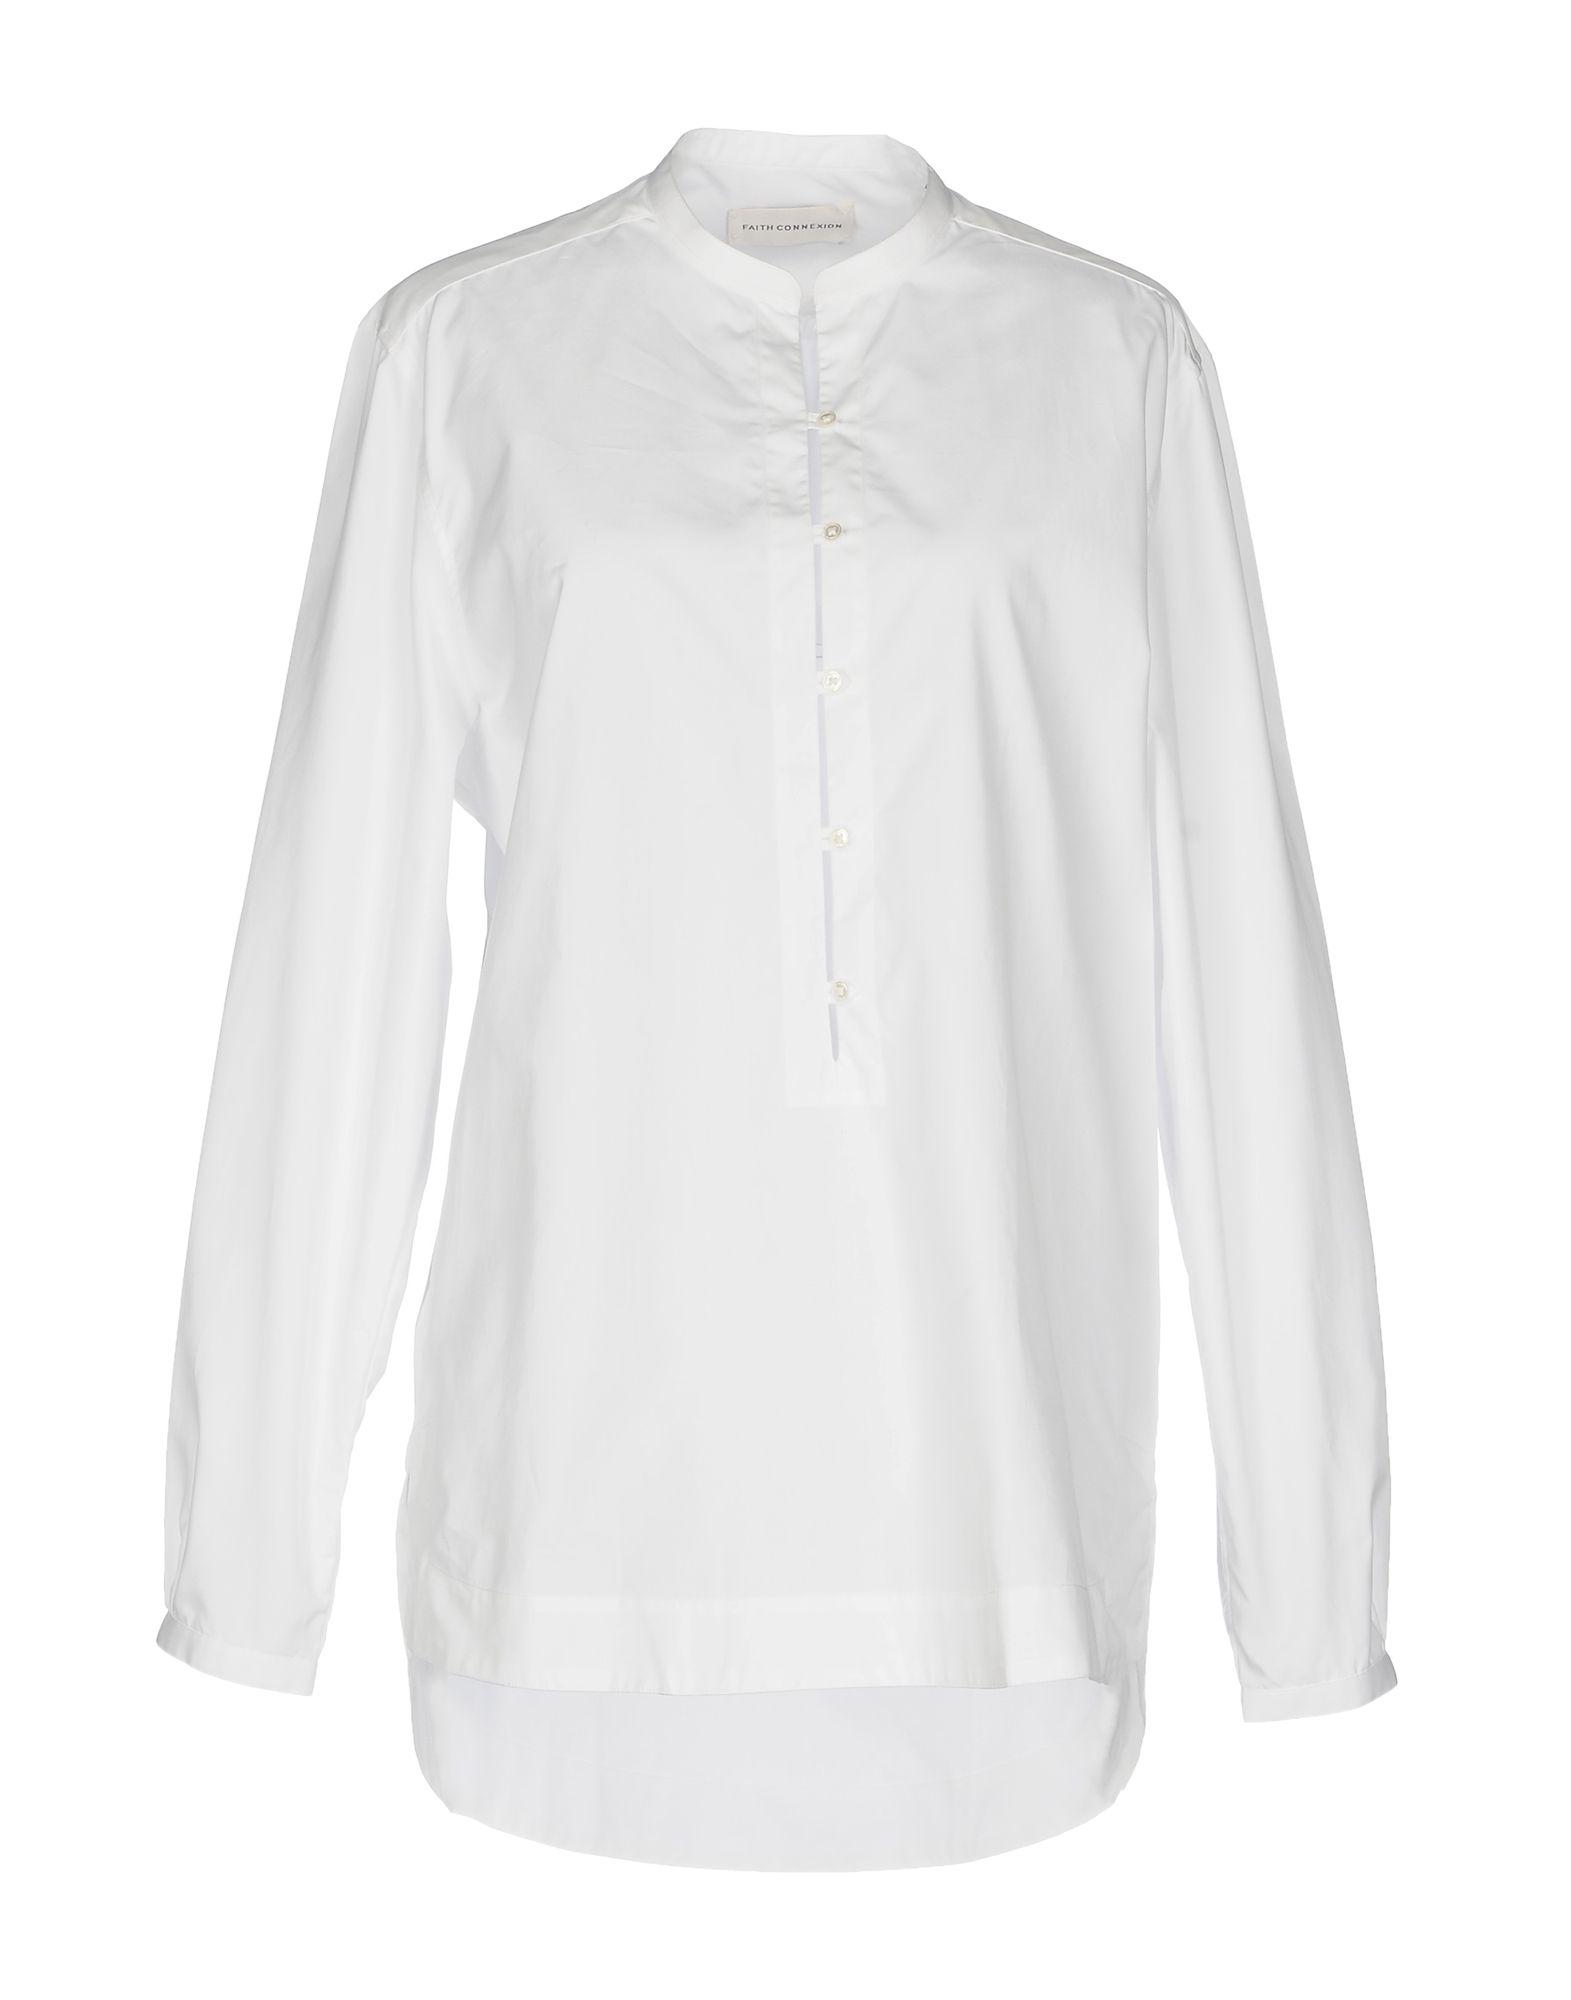 Camicie E Bluse Tinta Unita Faith Connexion Donna - Acquista online su xzJOaWP